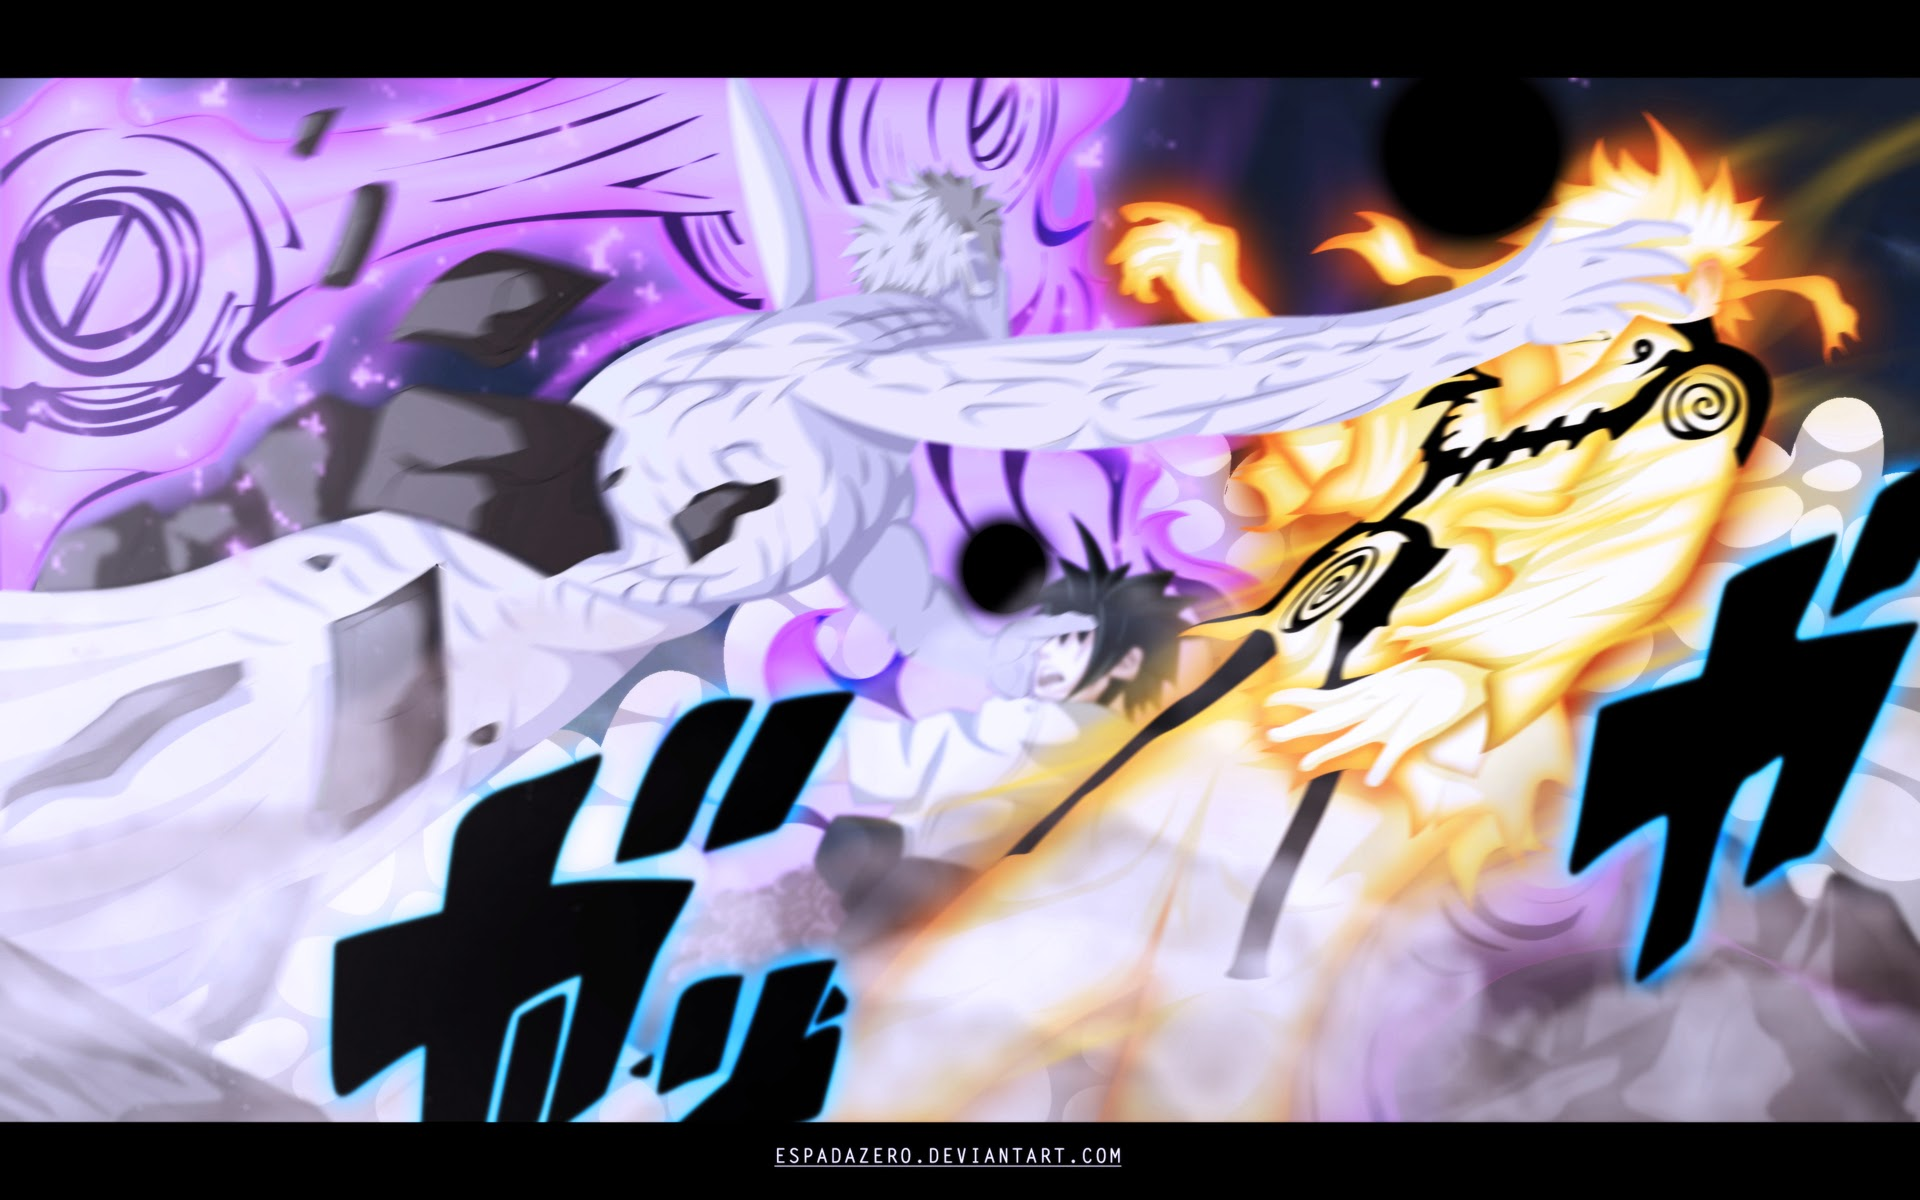 Free Download Naruto And Naruto Vs Obito Hd Anime Wallpaper